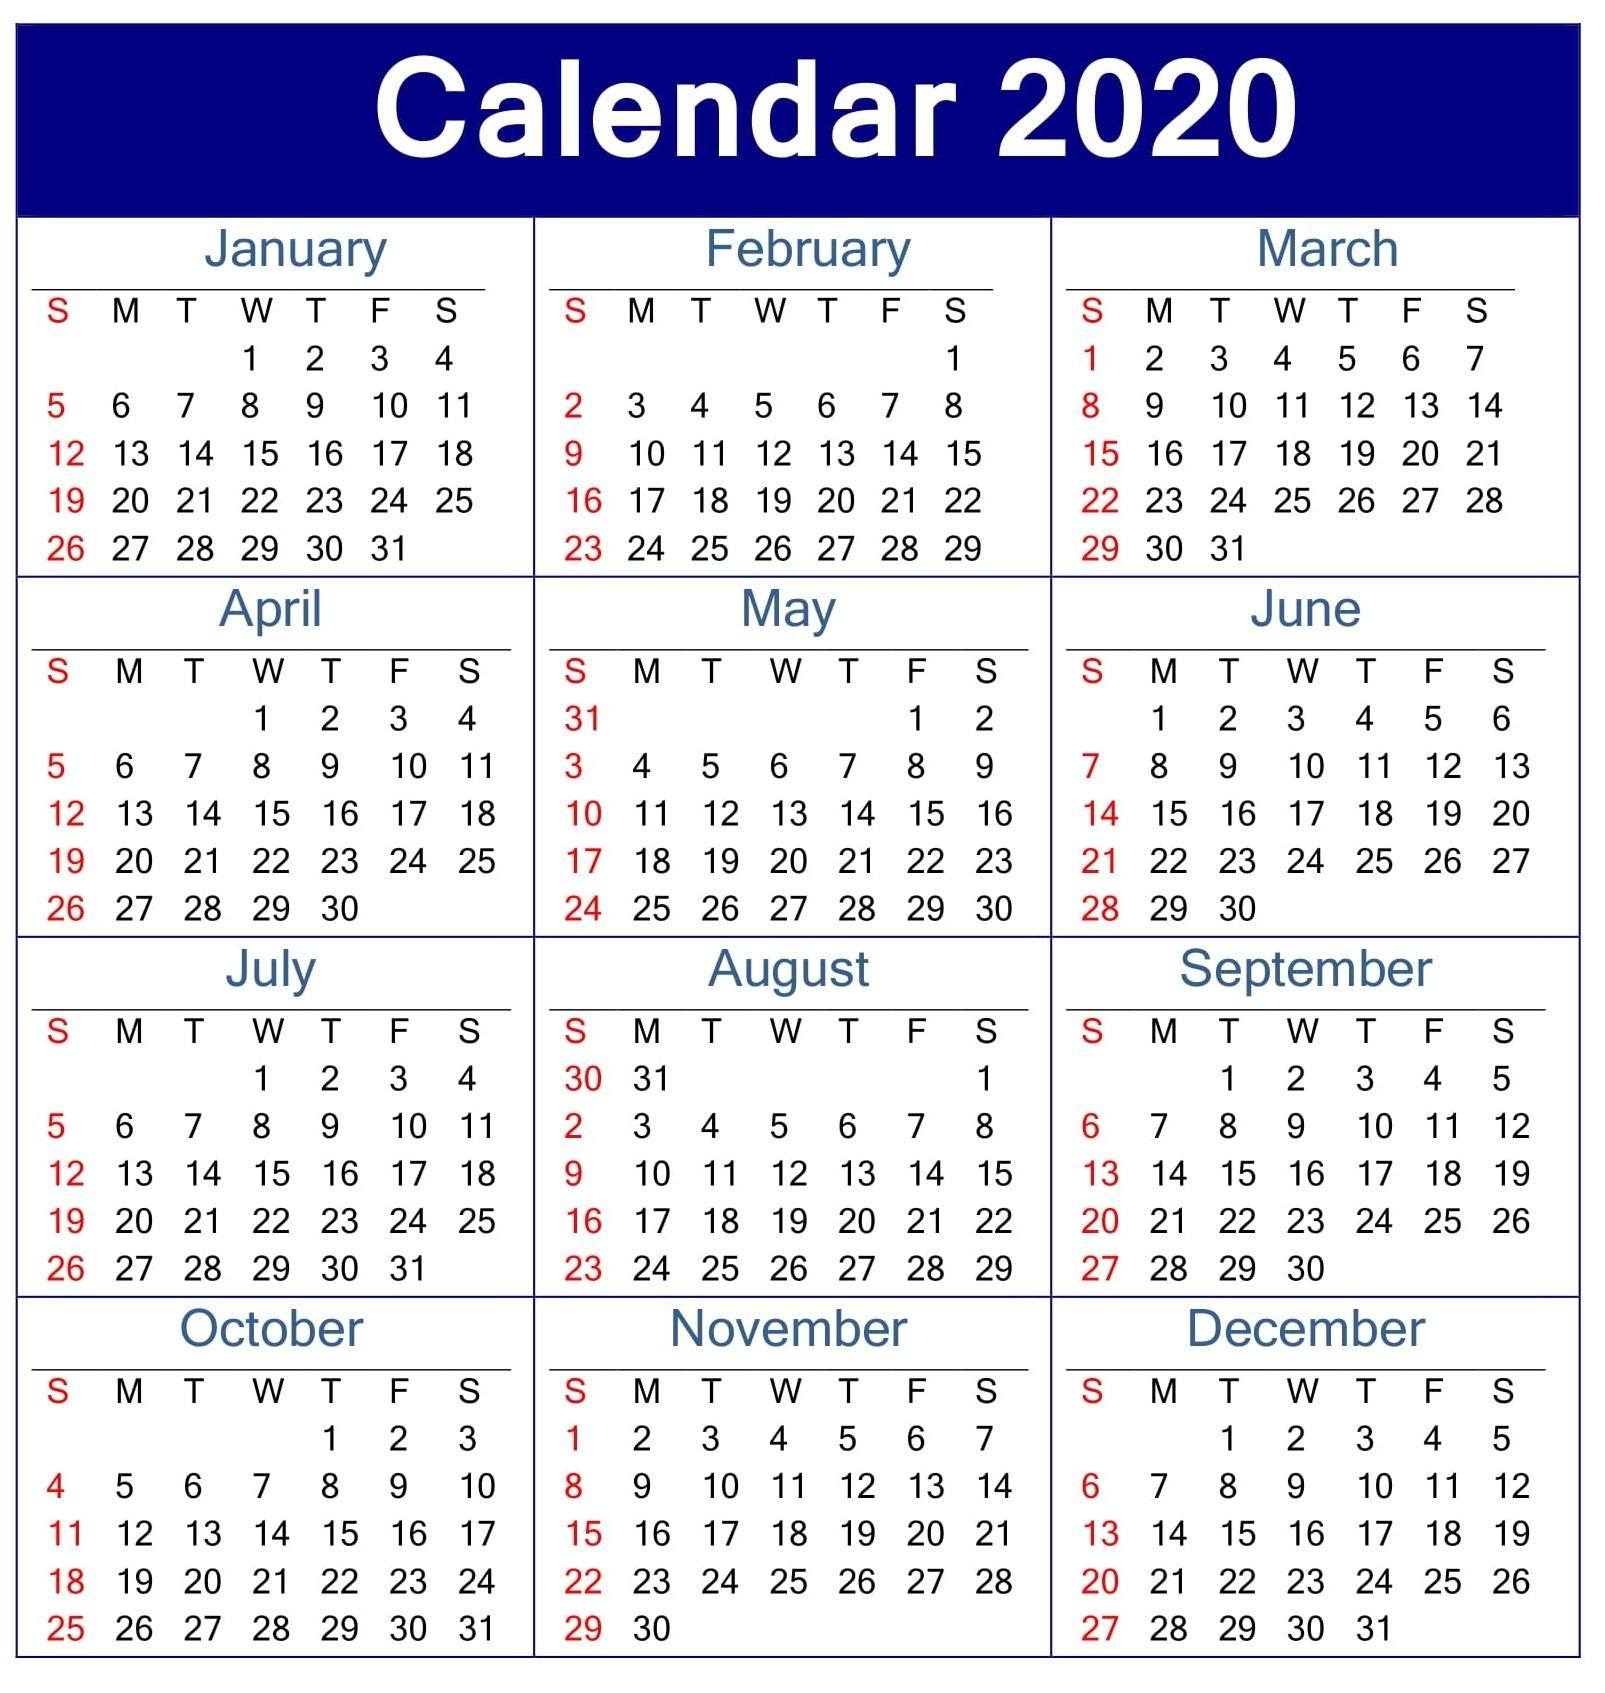 Printable Calendar 2020 Pdf Template – Free Latest Calendar intended for 2020 Employee Attendance Calendar Printable